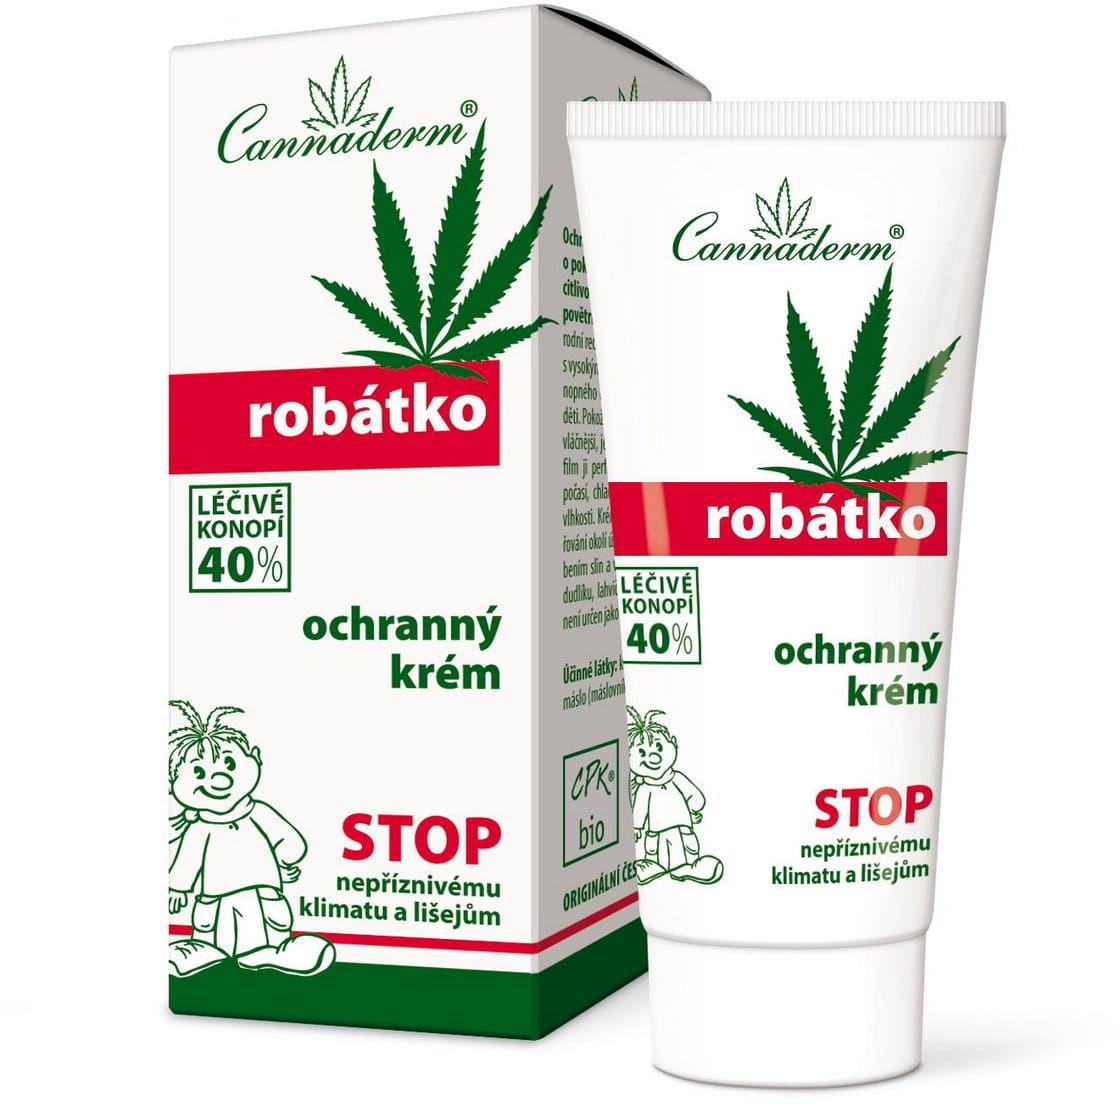 Robatko Krem ochronny dla dzieci 40% oleju z konopi 50g